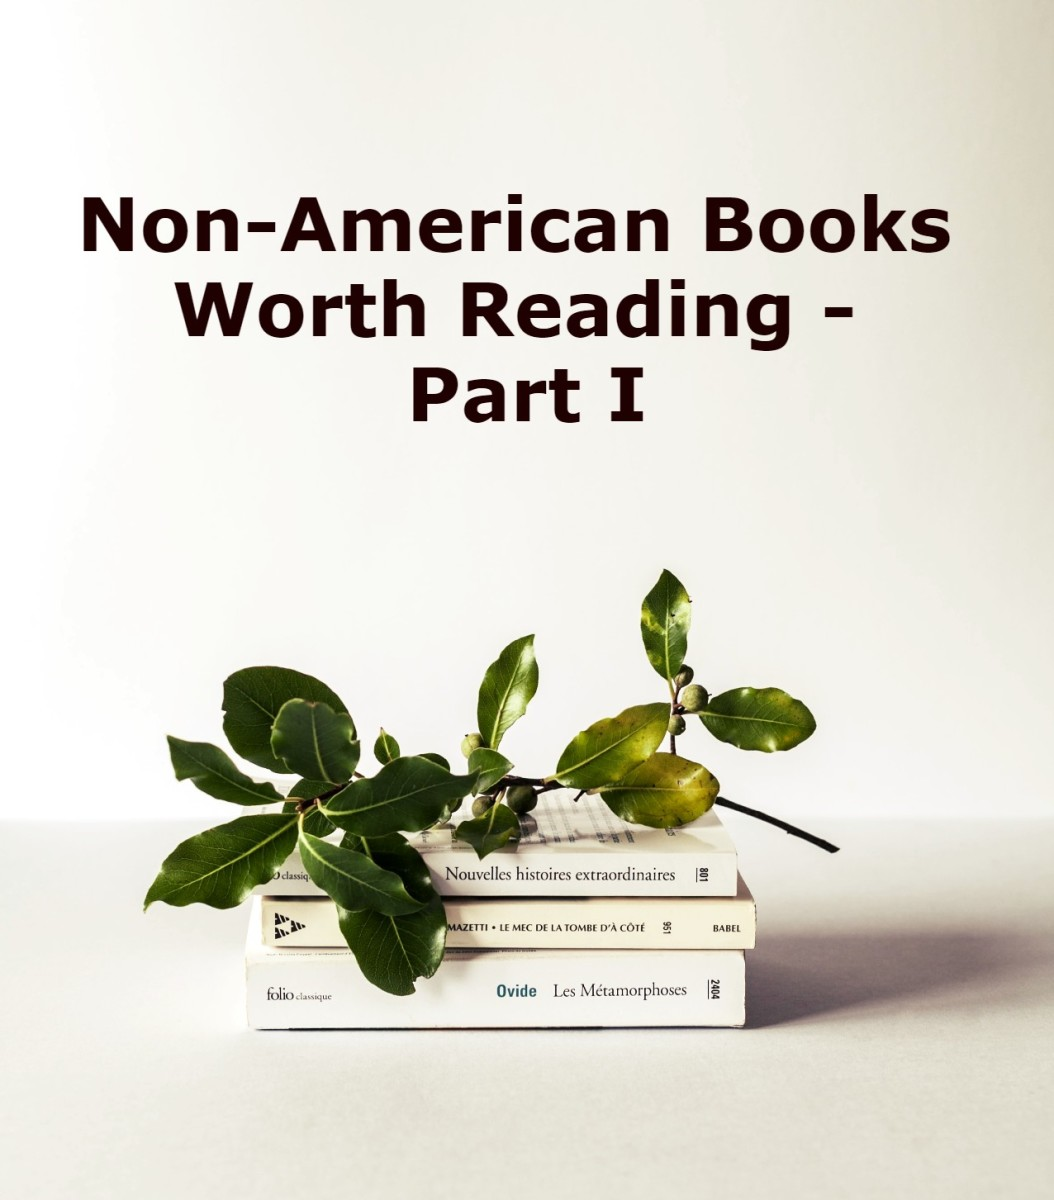 7 Non-American Books Worth Reading - Part I